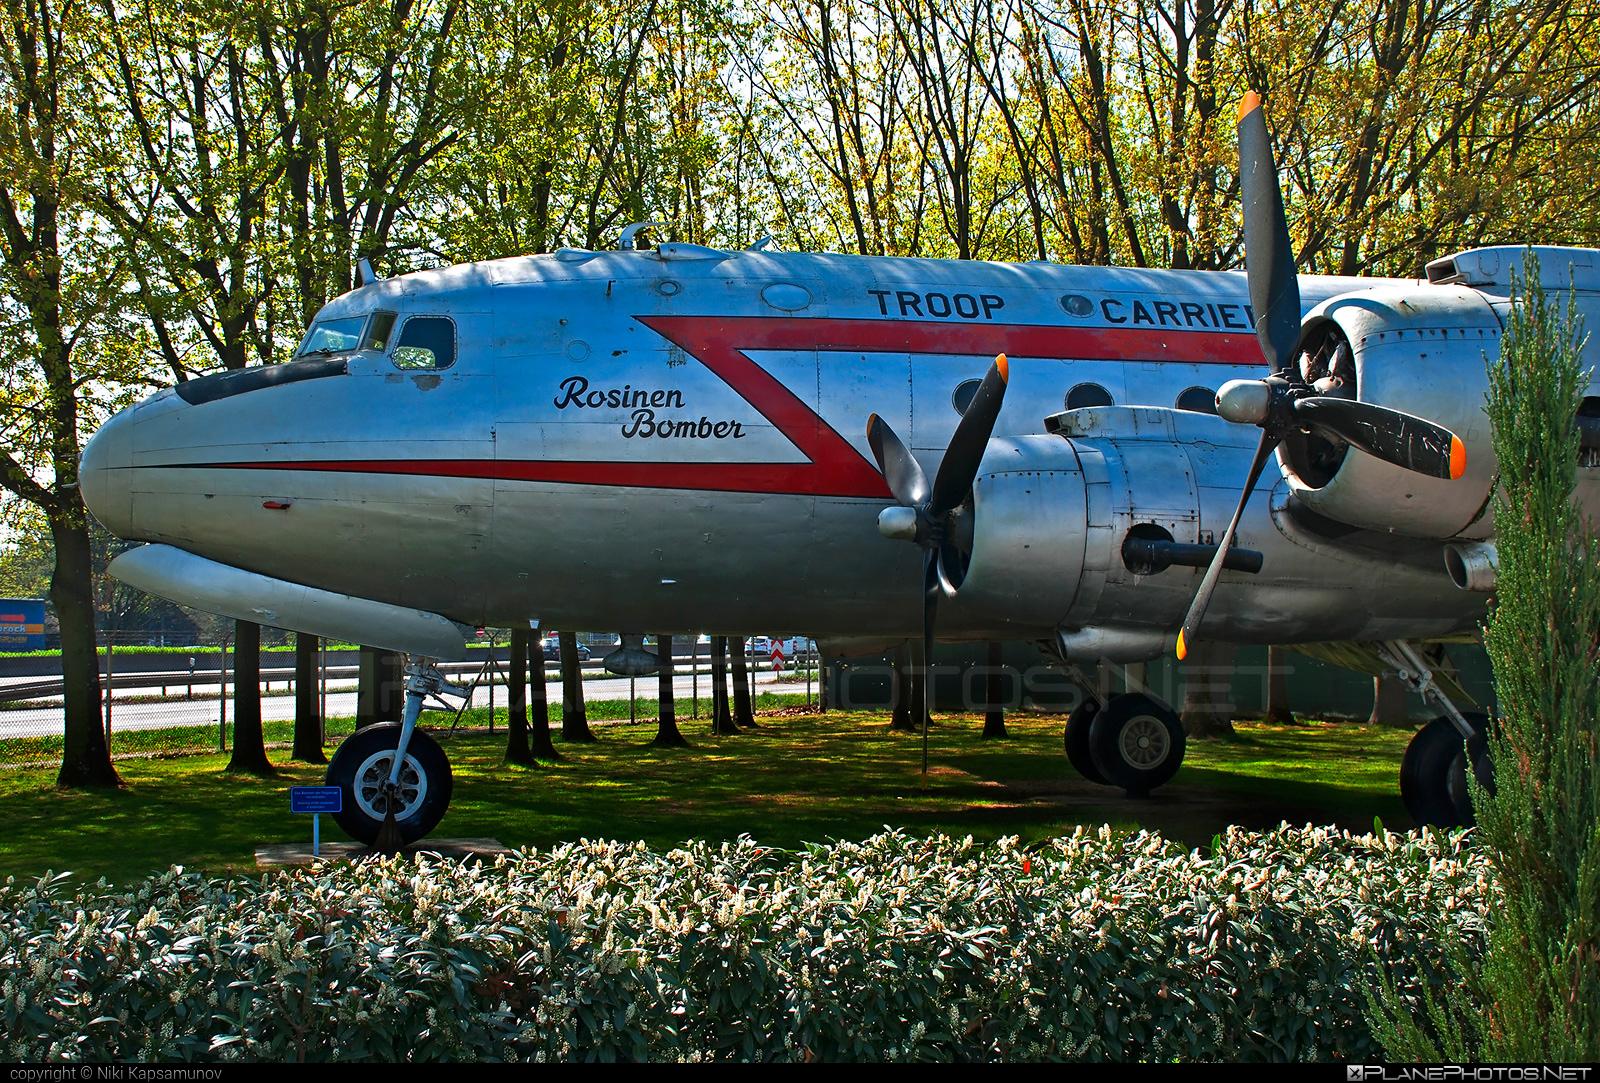 US Air Force (USAF) Douglas C-54E Skymaster - 44-9063 #berlinairliftmemorial #douglas #rosinenbomber #usaf #usairforce